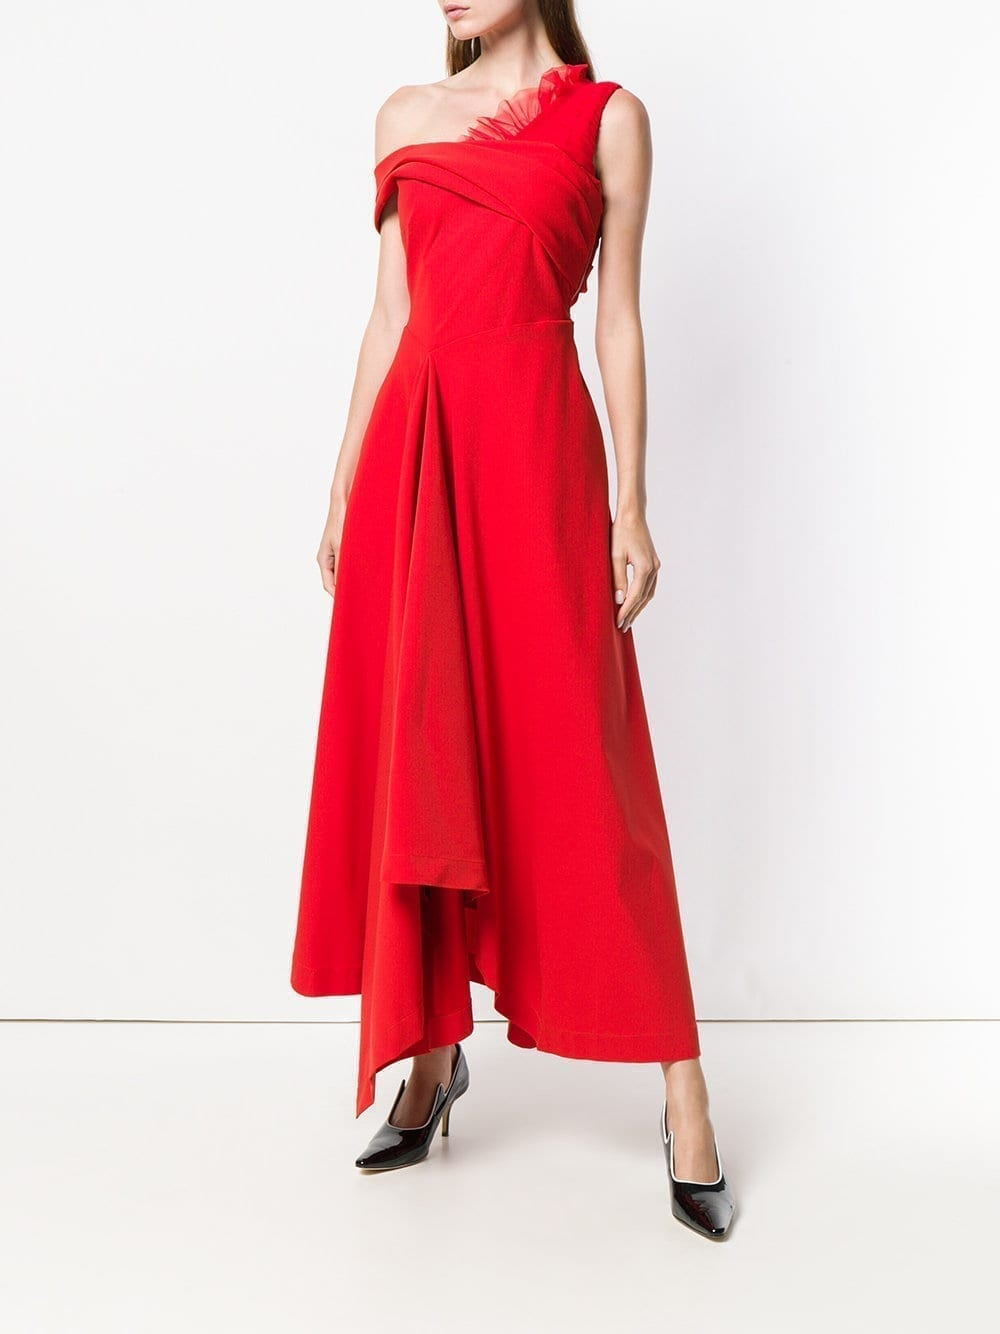 PREEN BY THORNTON BREGAZZI Carol Red Dress